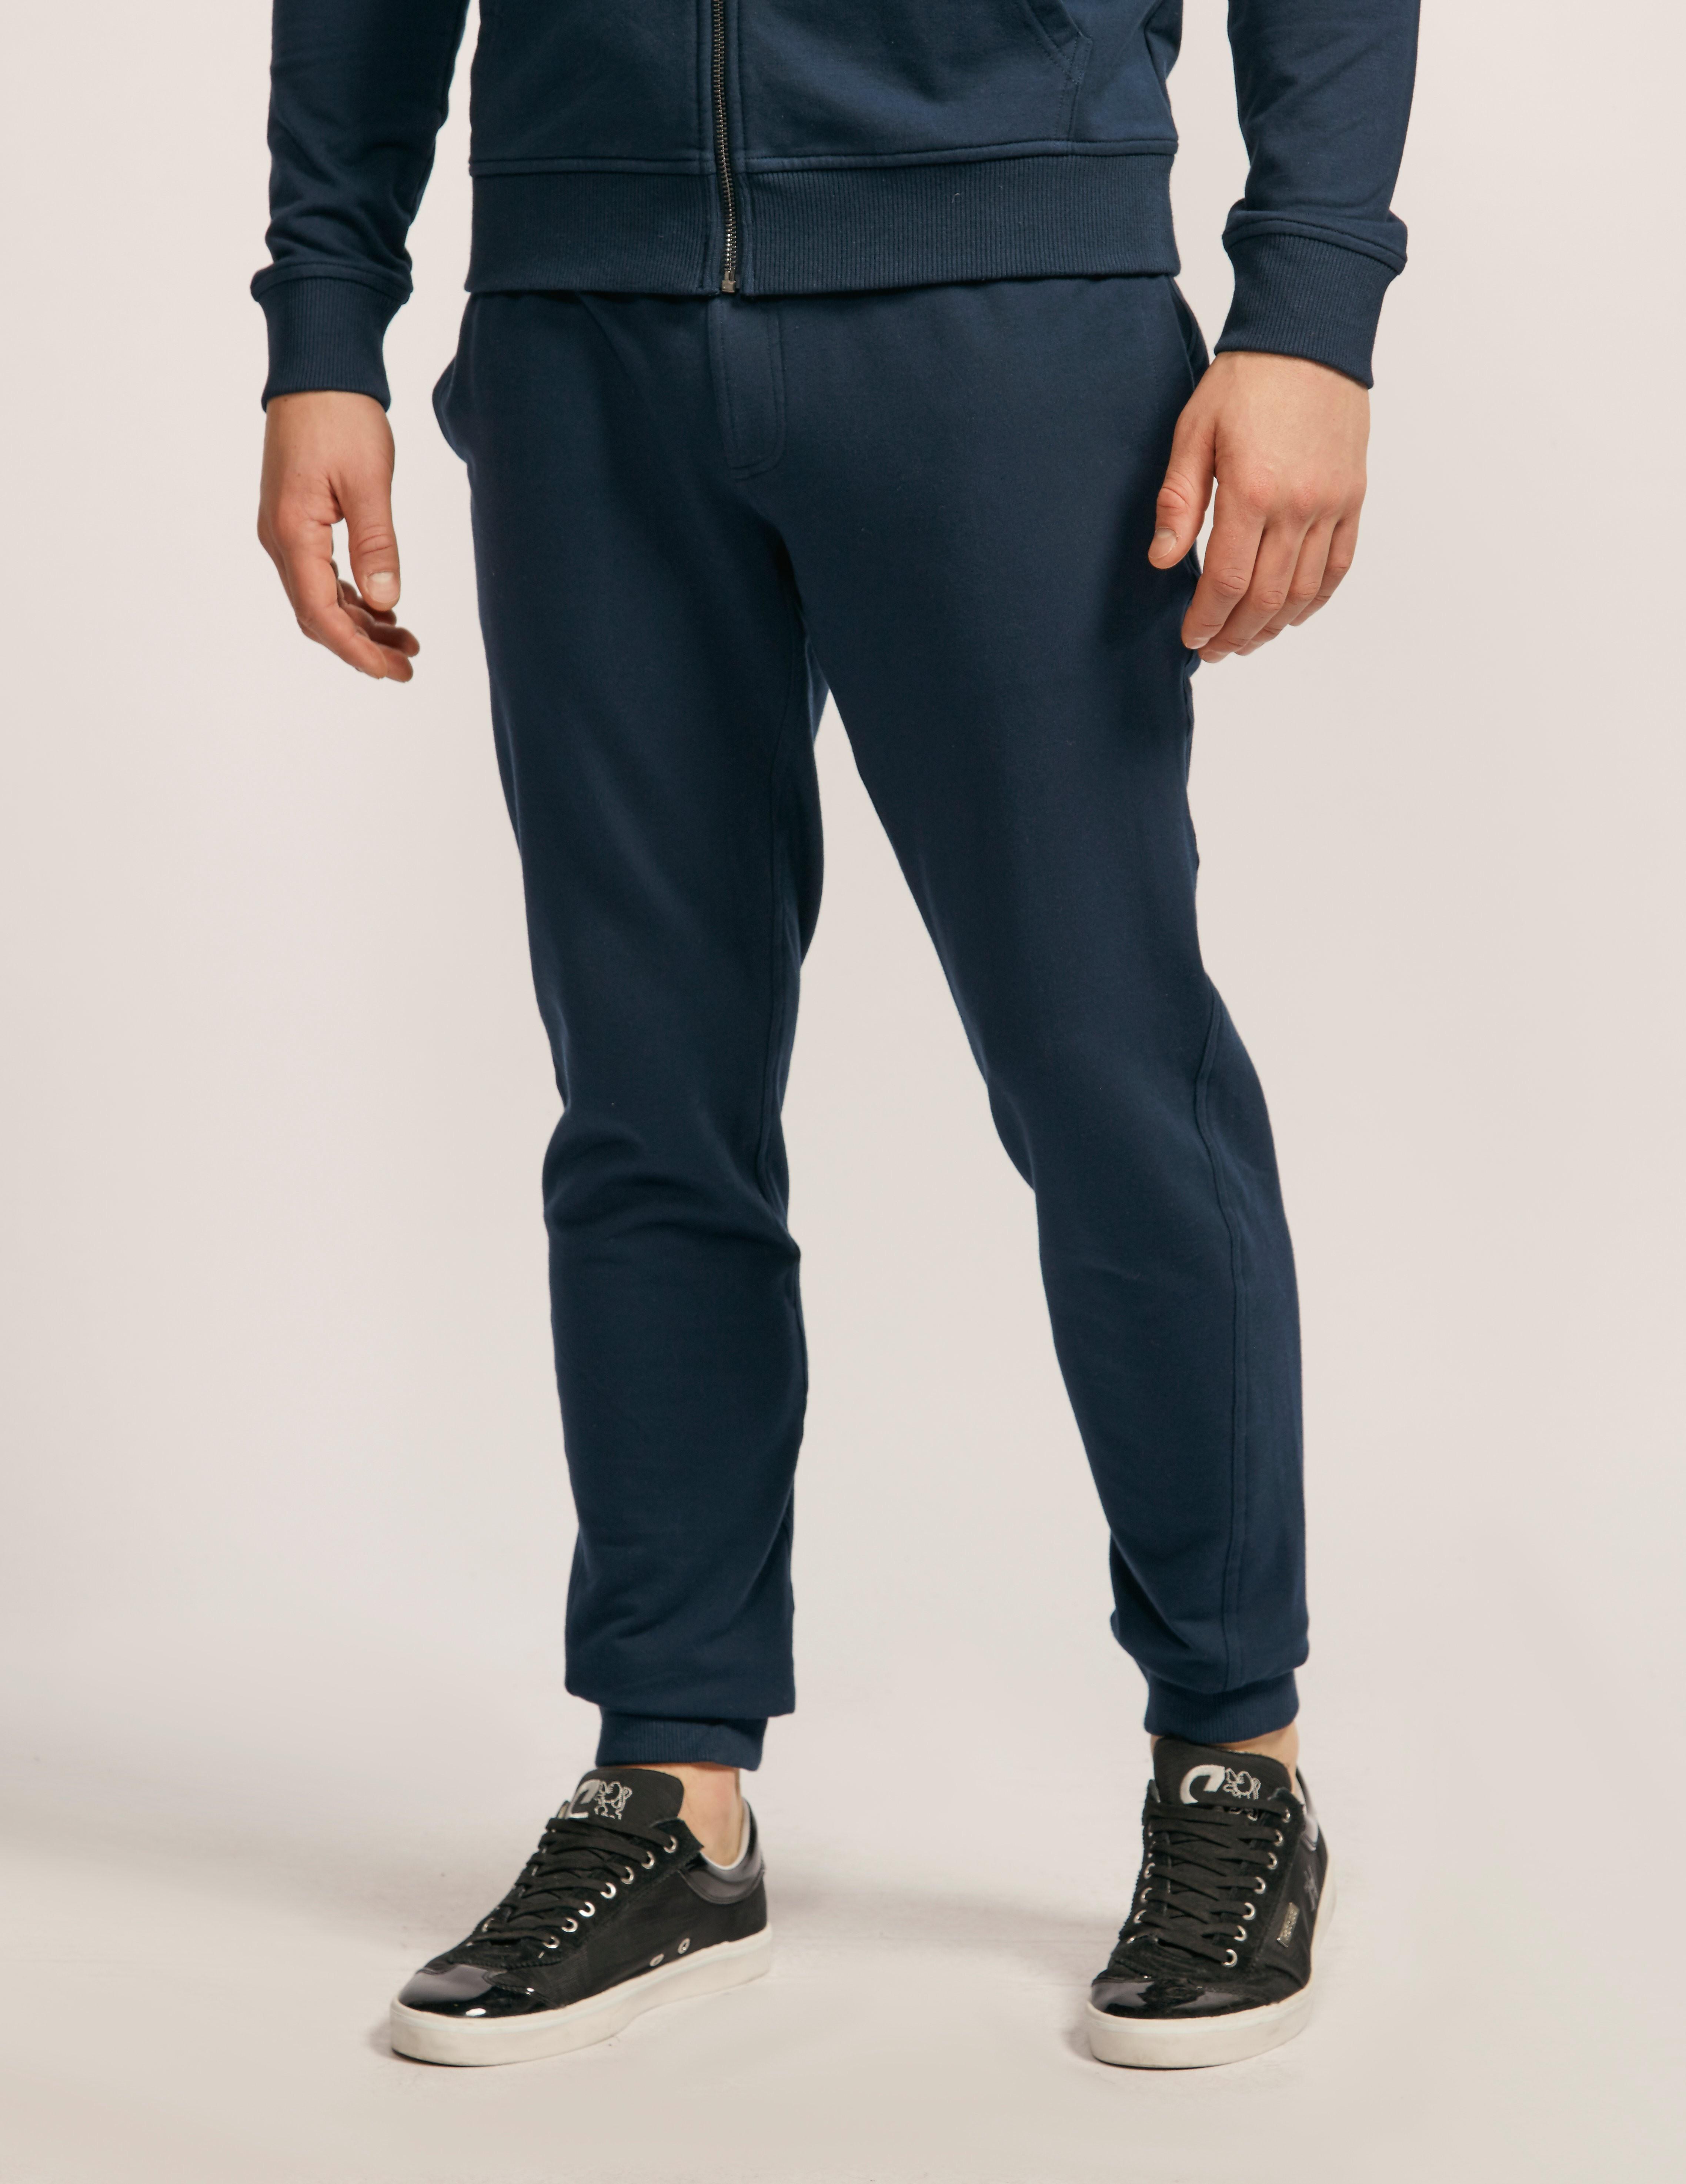 Michael Kors Stretch Fleece Cuffed Track Pant